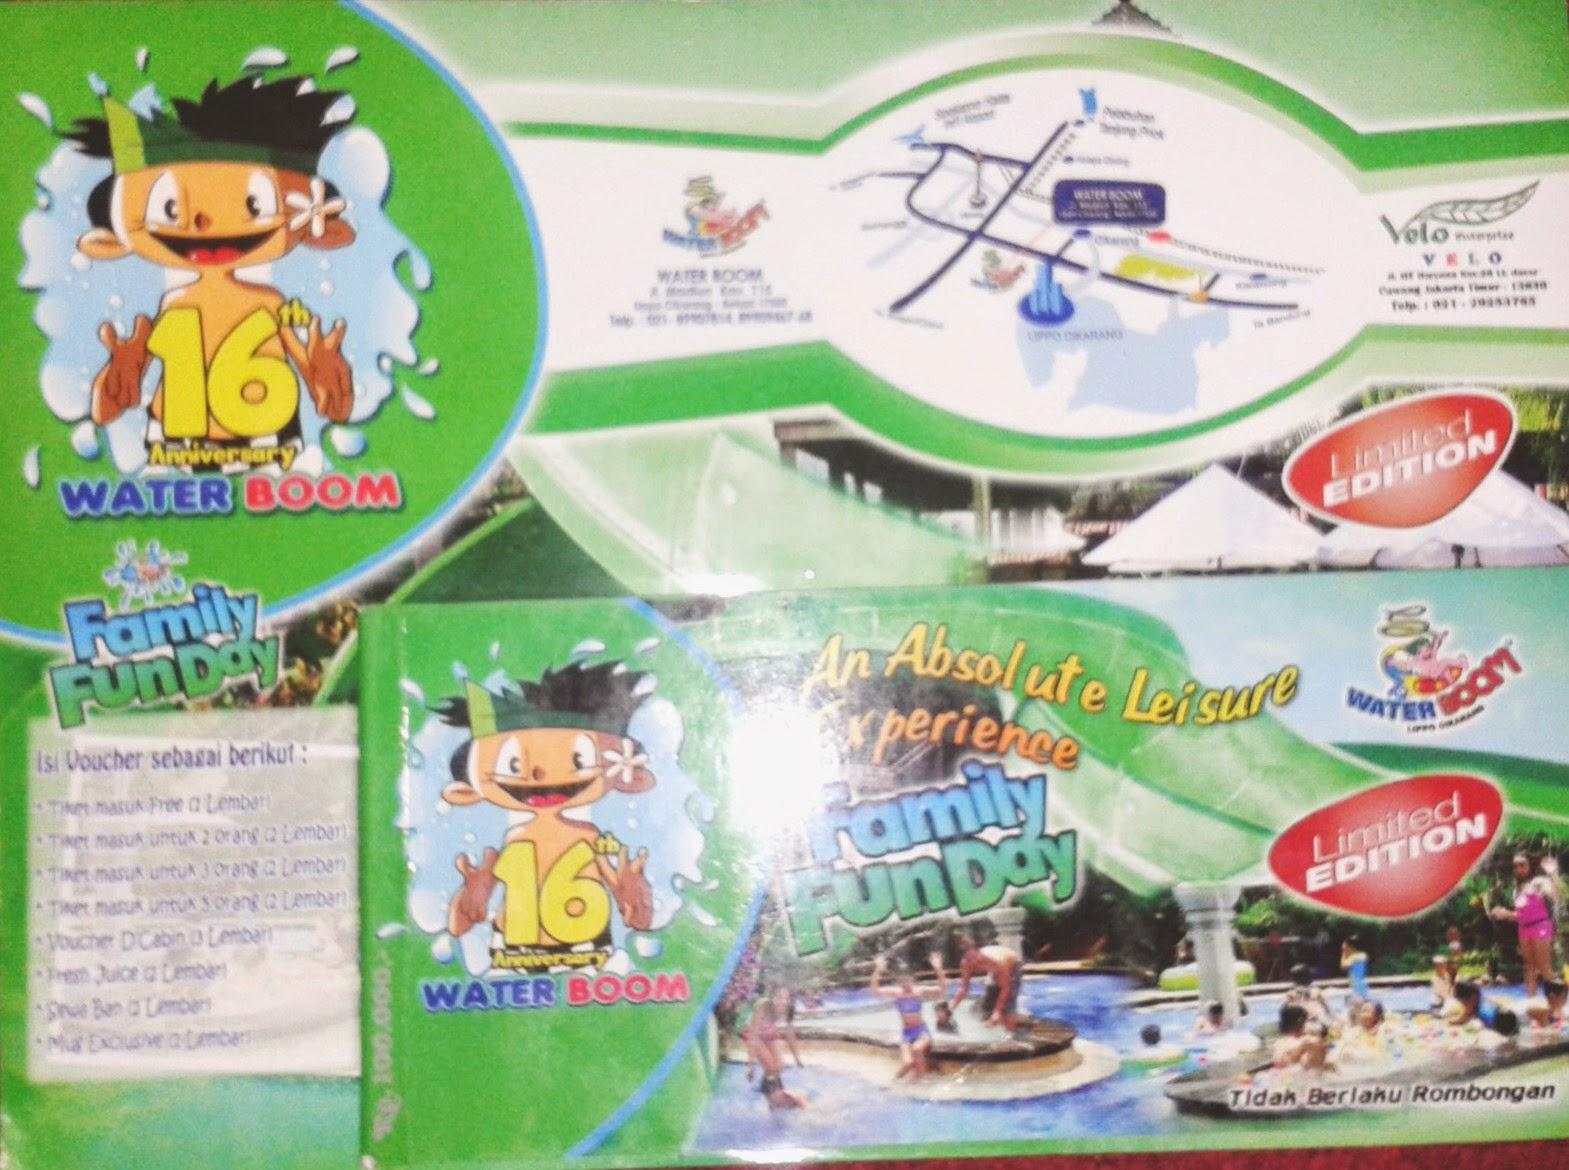 Promo Wahana Air Voucher  Tiket Masuk Megati Waterpark Cikarang Web Http Posted By